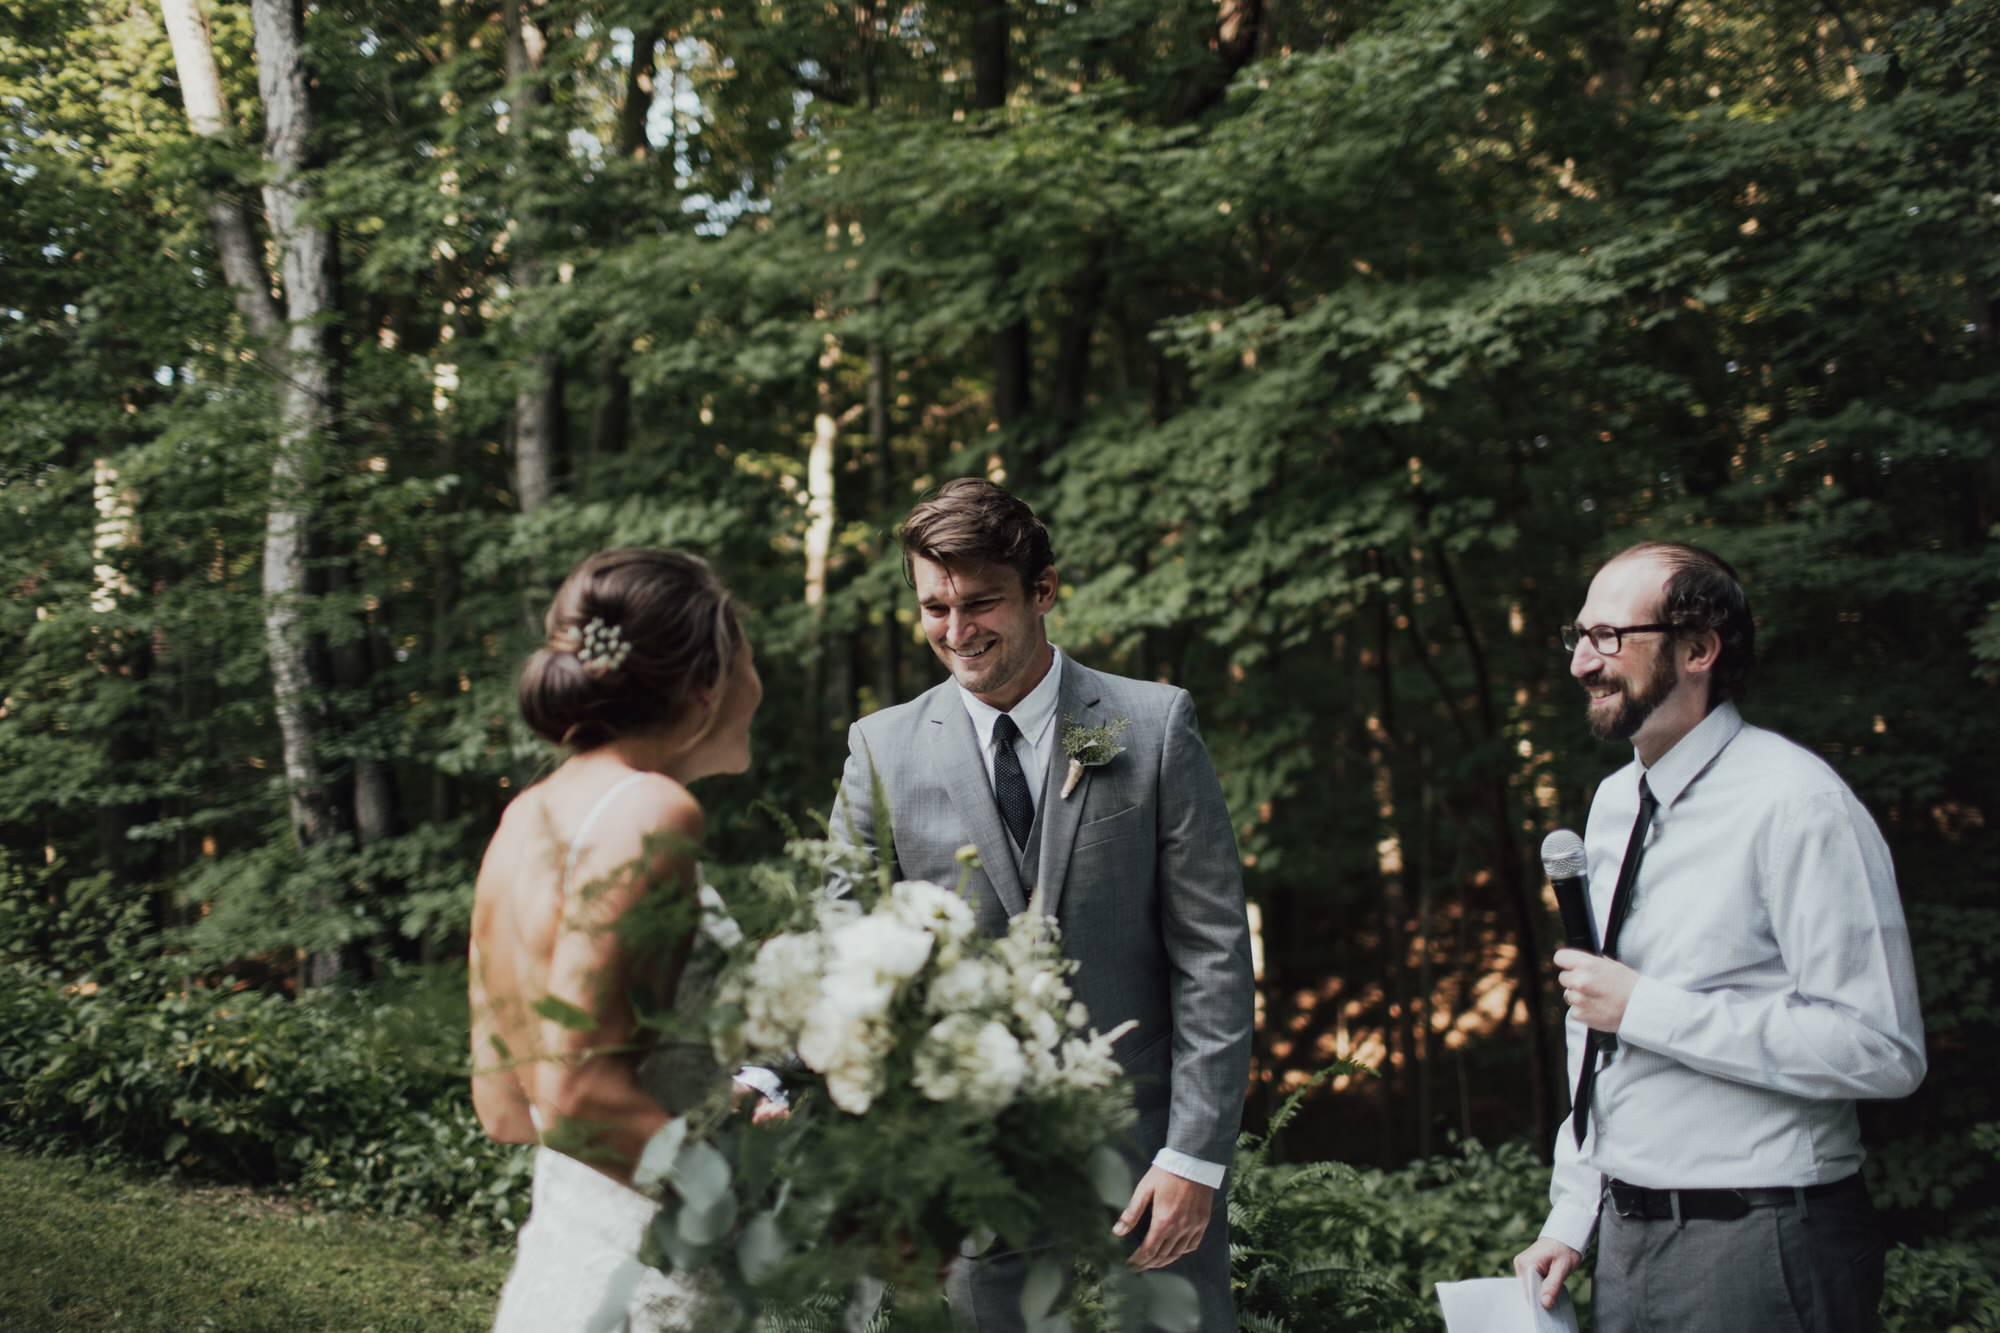 emily-aaron-rochester-new-york-wedding-photographer-63.JPG